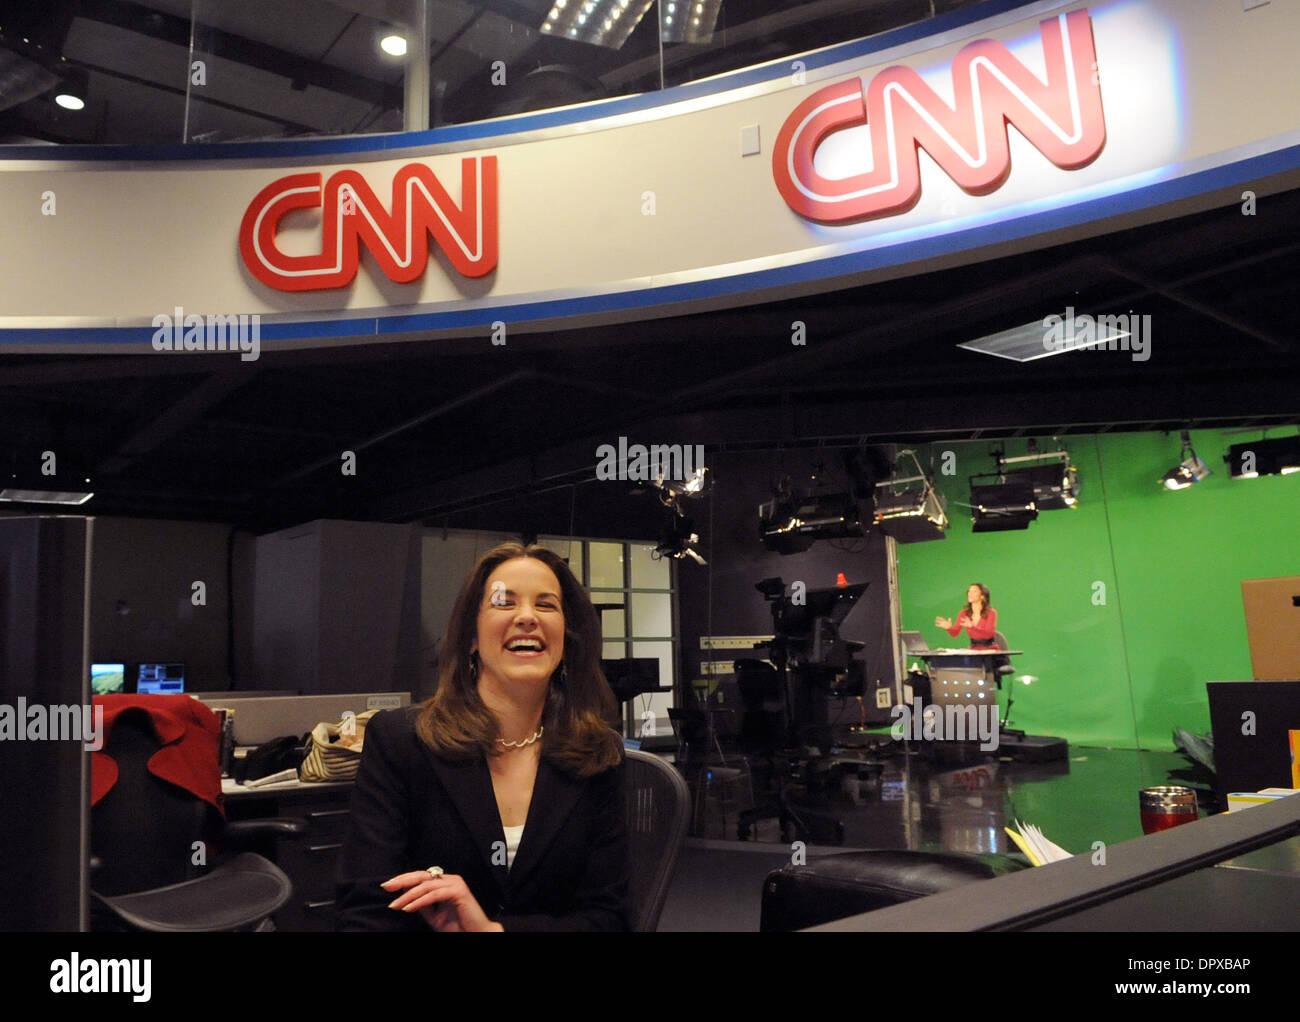 Jan 13, 2009   Atlanta, Georgia, USA   CNN.com Live Anchor MELISSA LONG  Speaks With Colleagues In The CNN.com Newsroom At The CNN Center. Part 91